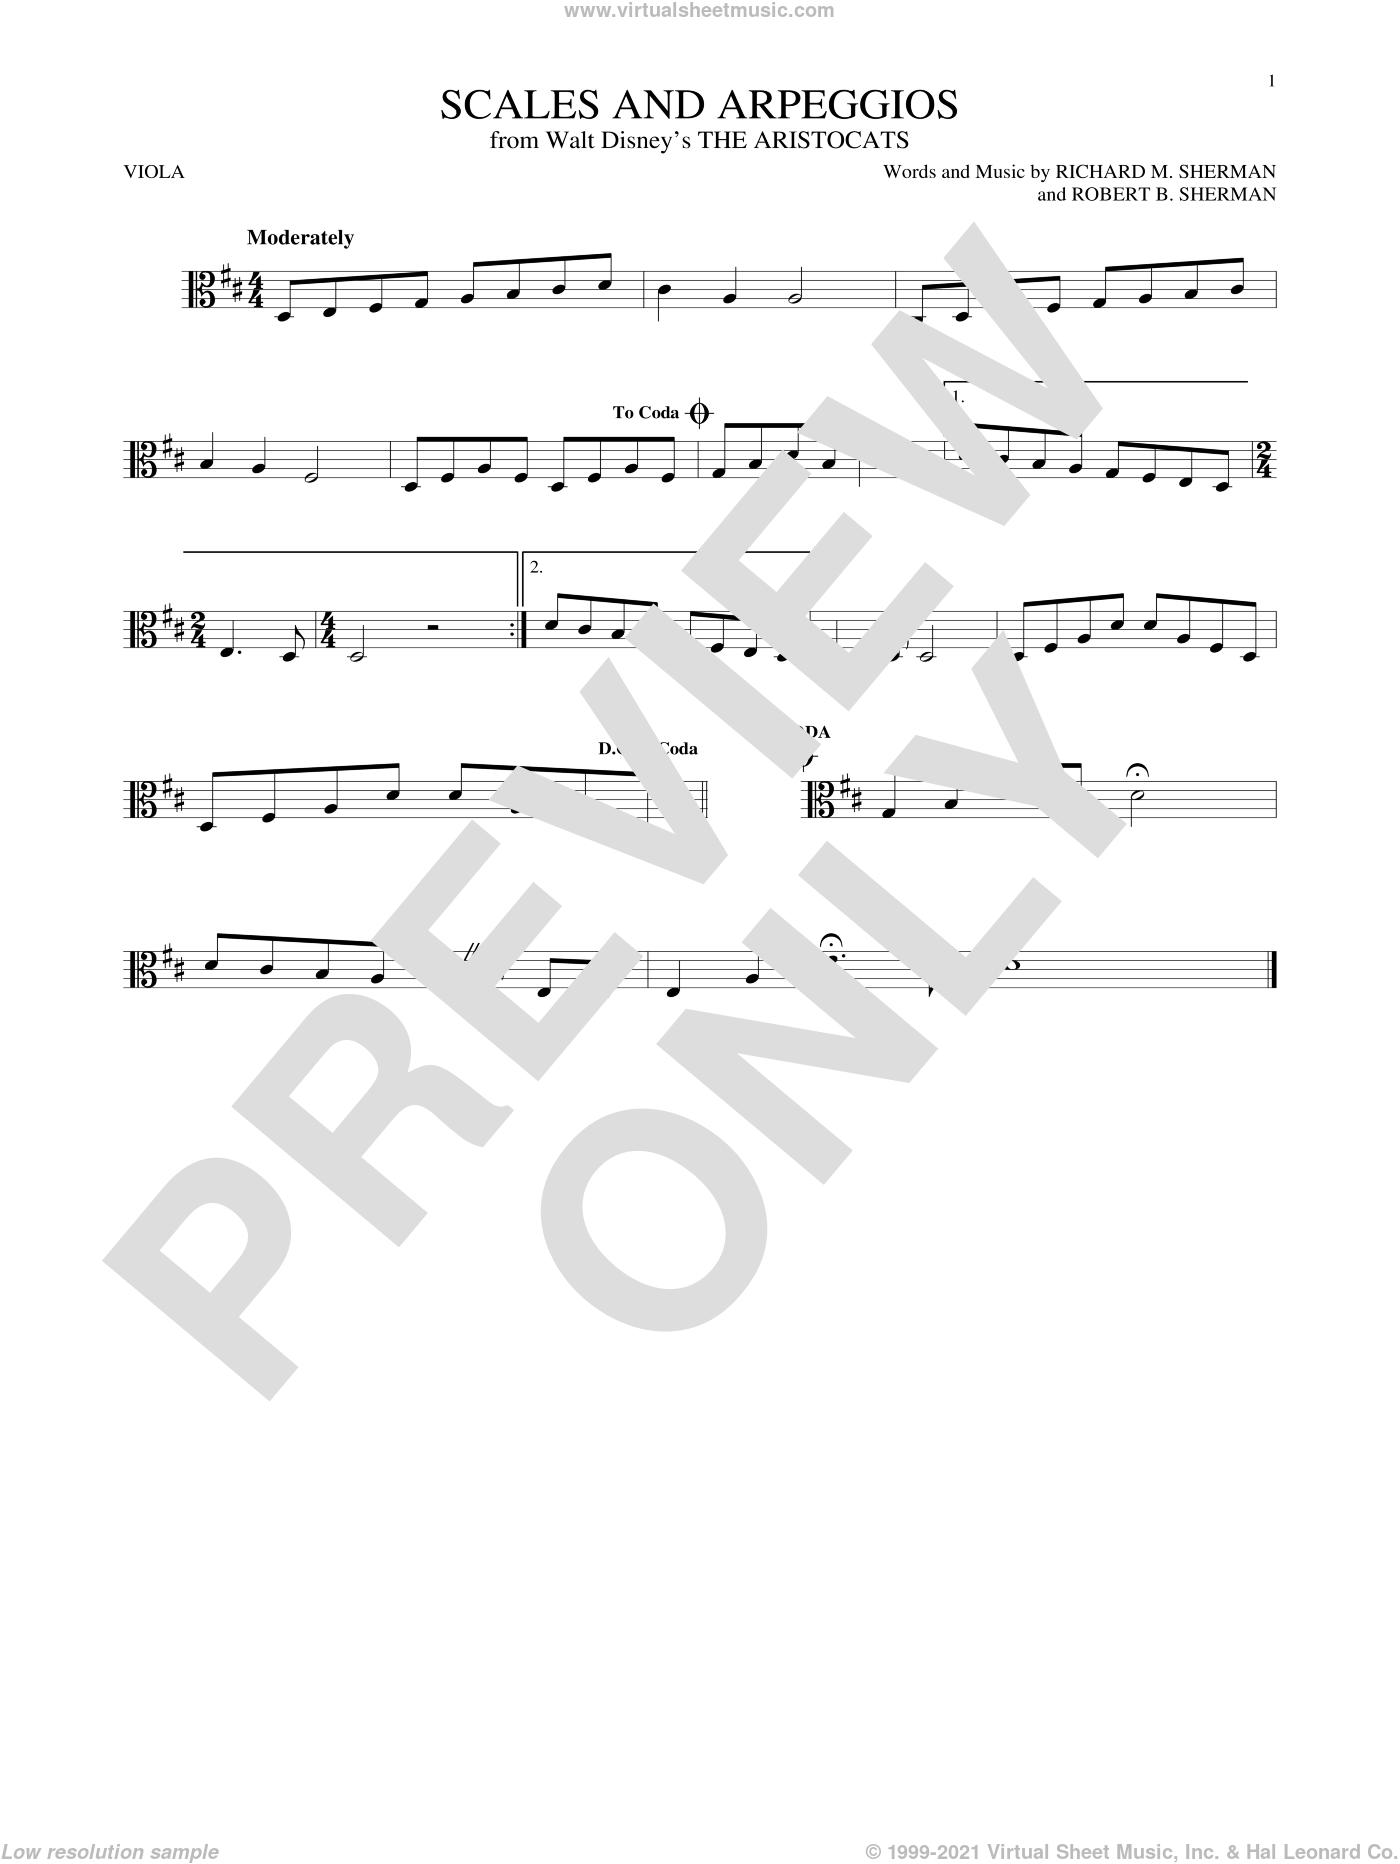 Scales And Arpeggios sheet music for viola solo by Richard M. Sherman, Richard & Robert Sherman and Robert B. Sherman, intermediate skill level